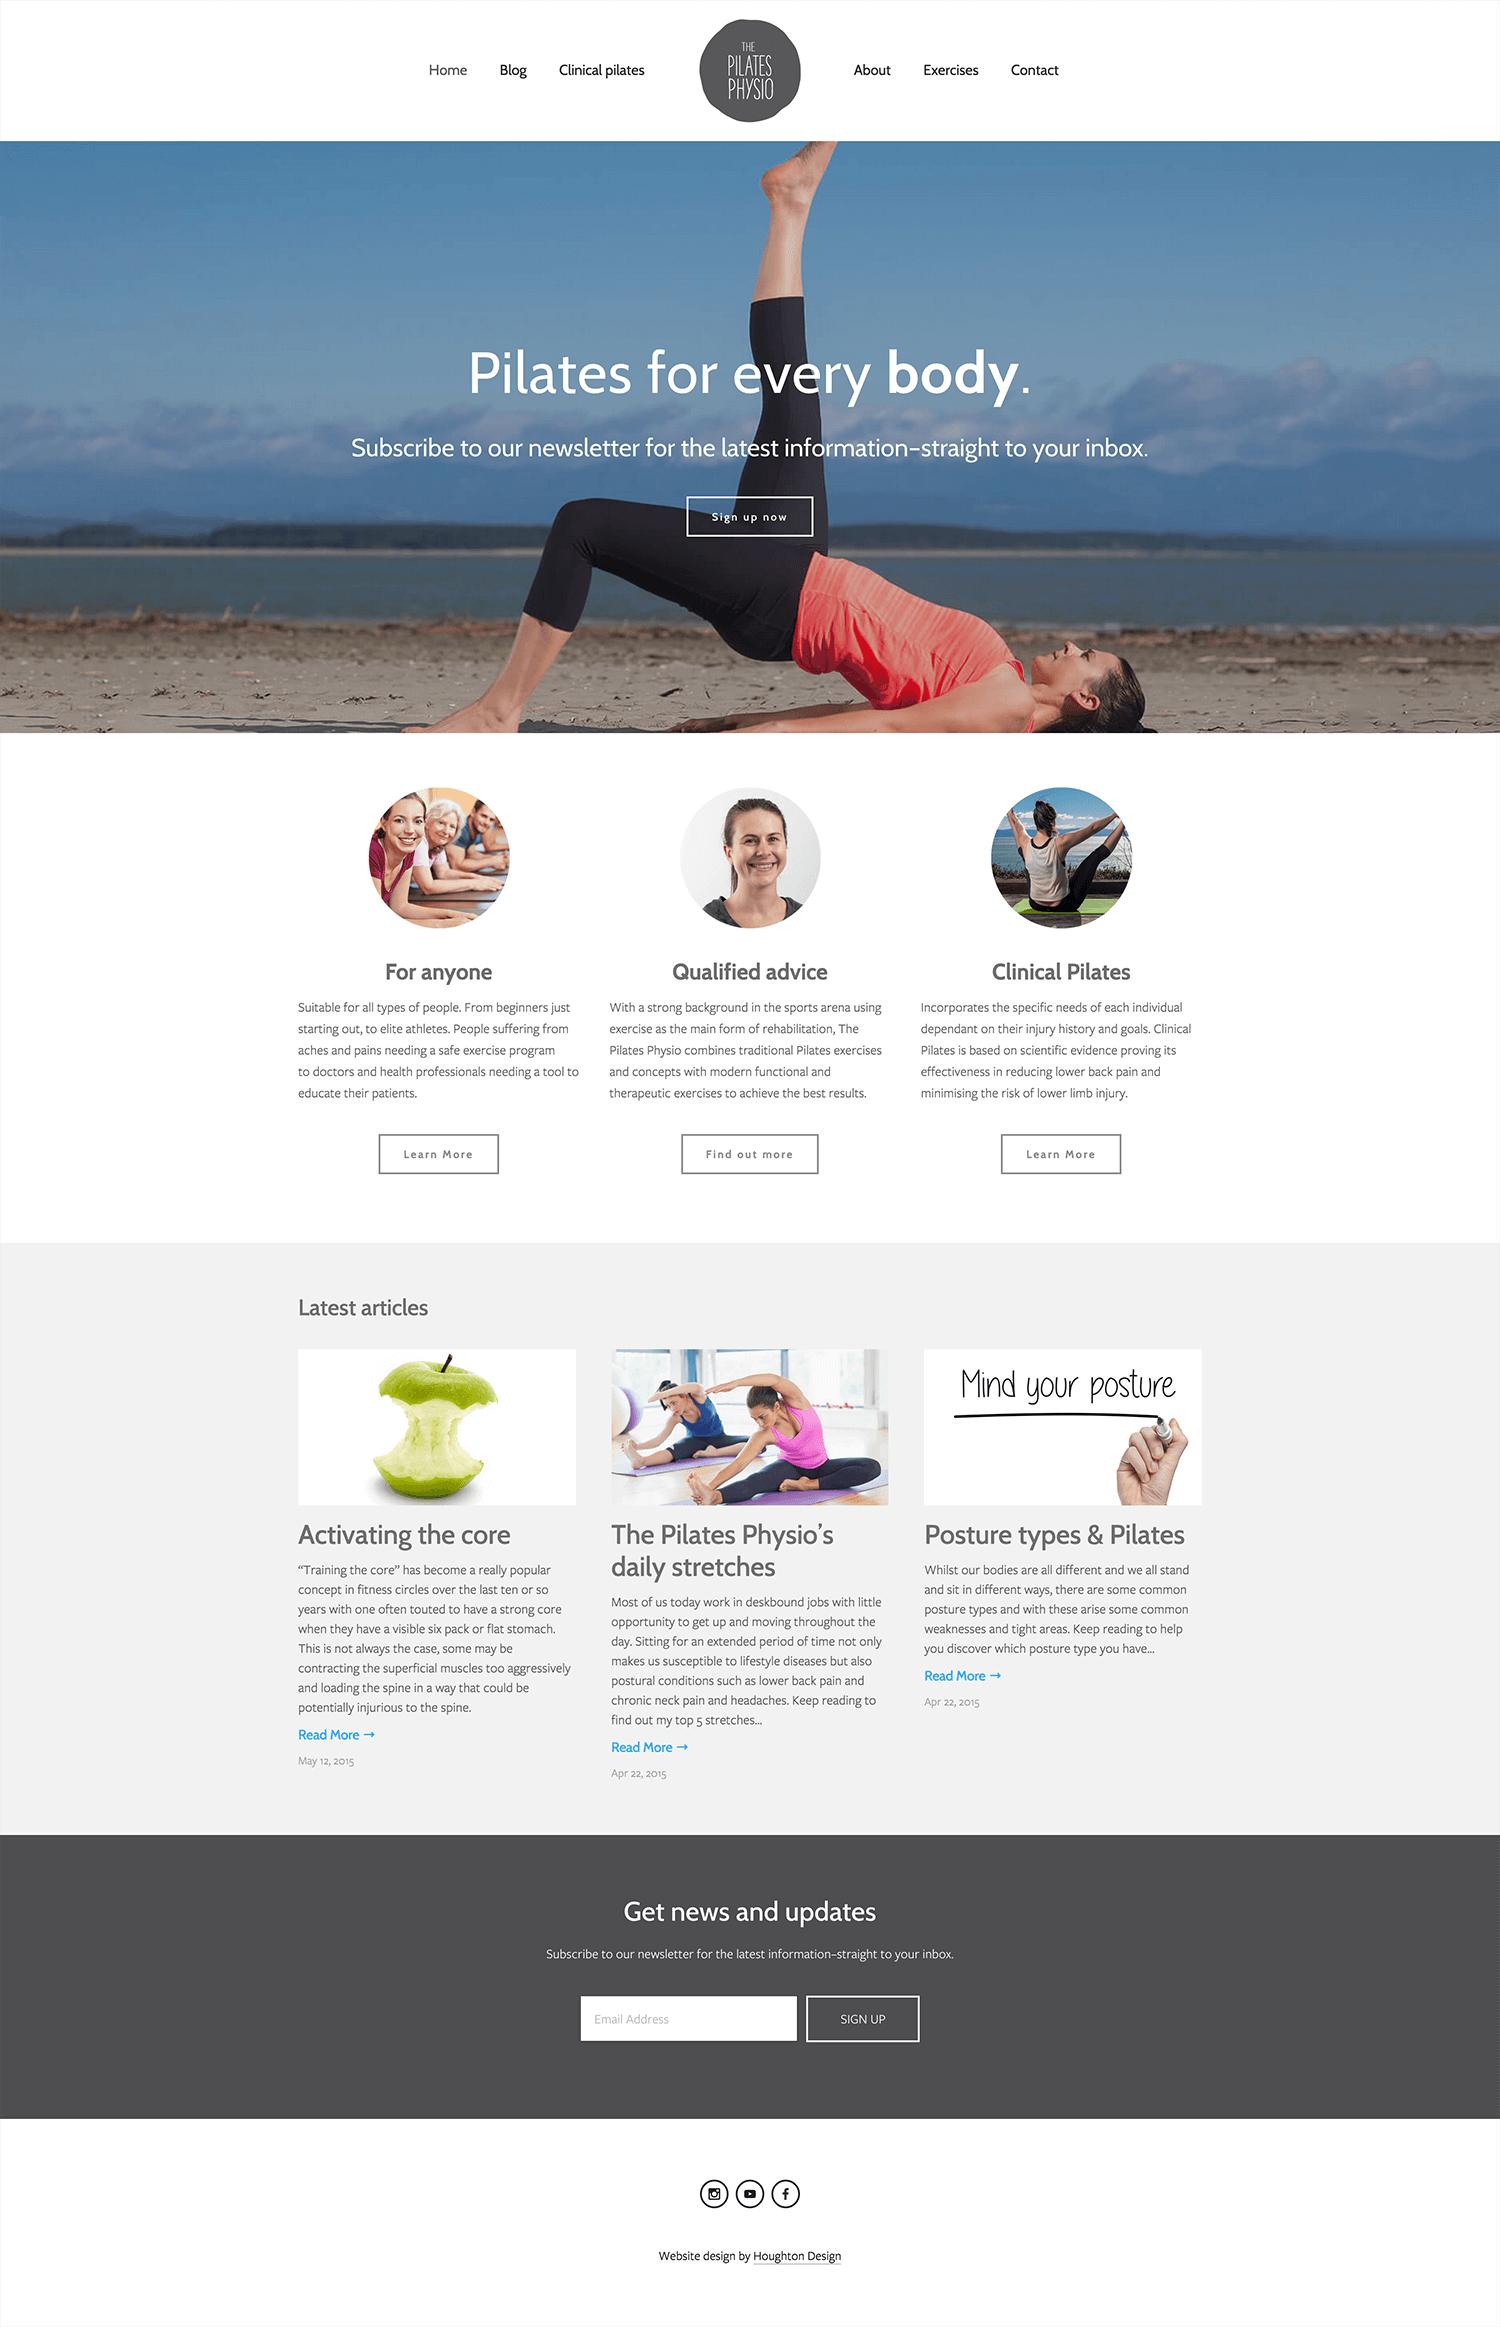 Squarespace website for The Pilates Physio - www.thepilatesphysio.com